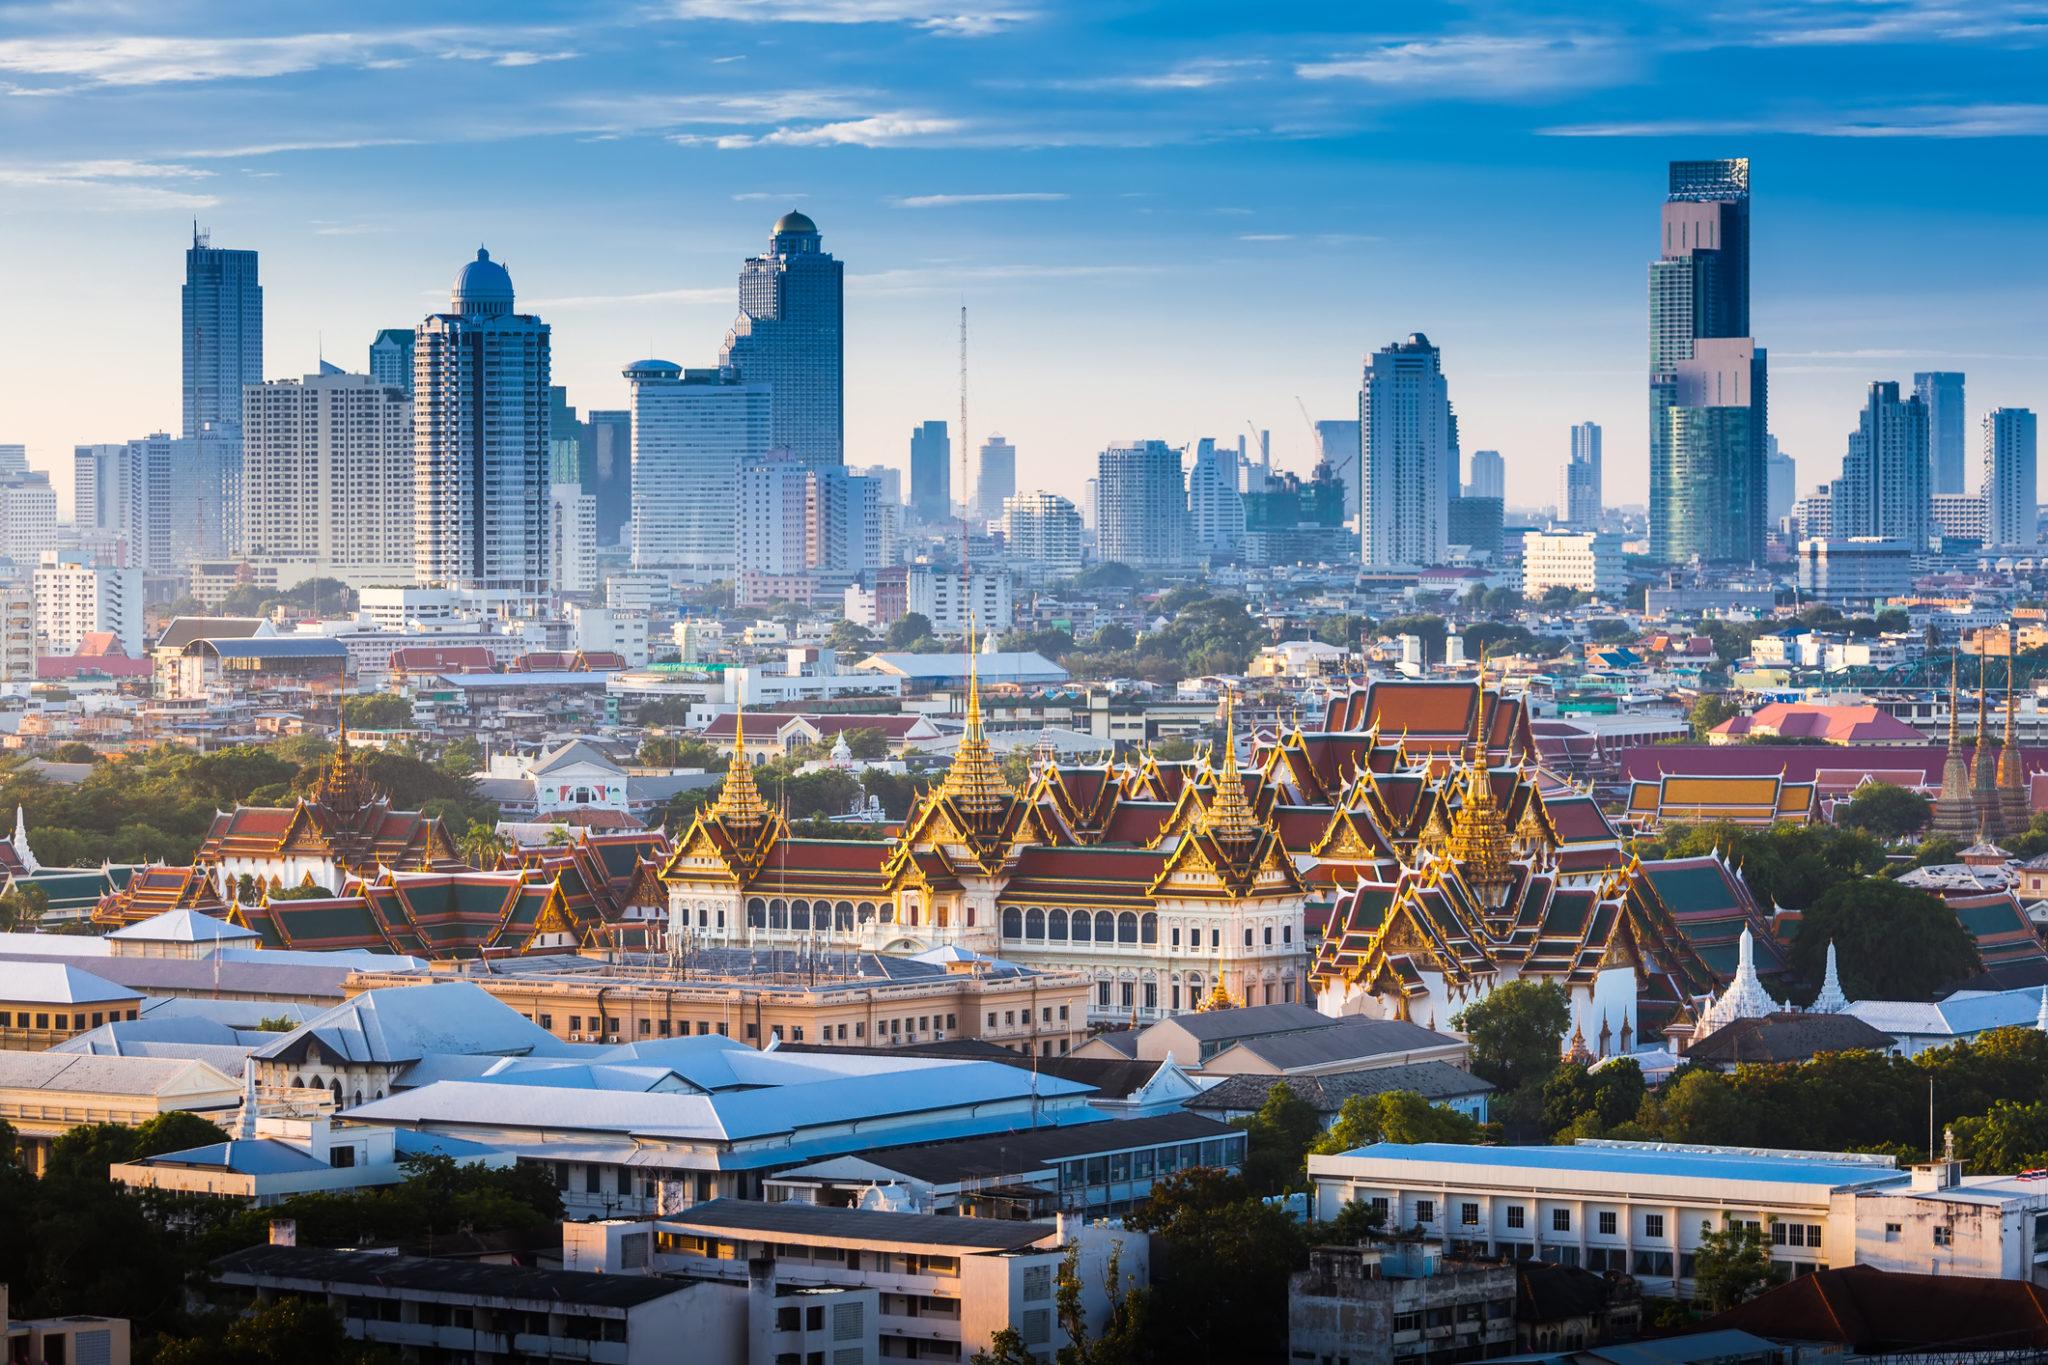 Thailand Economy To Shrink By 5.3%